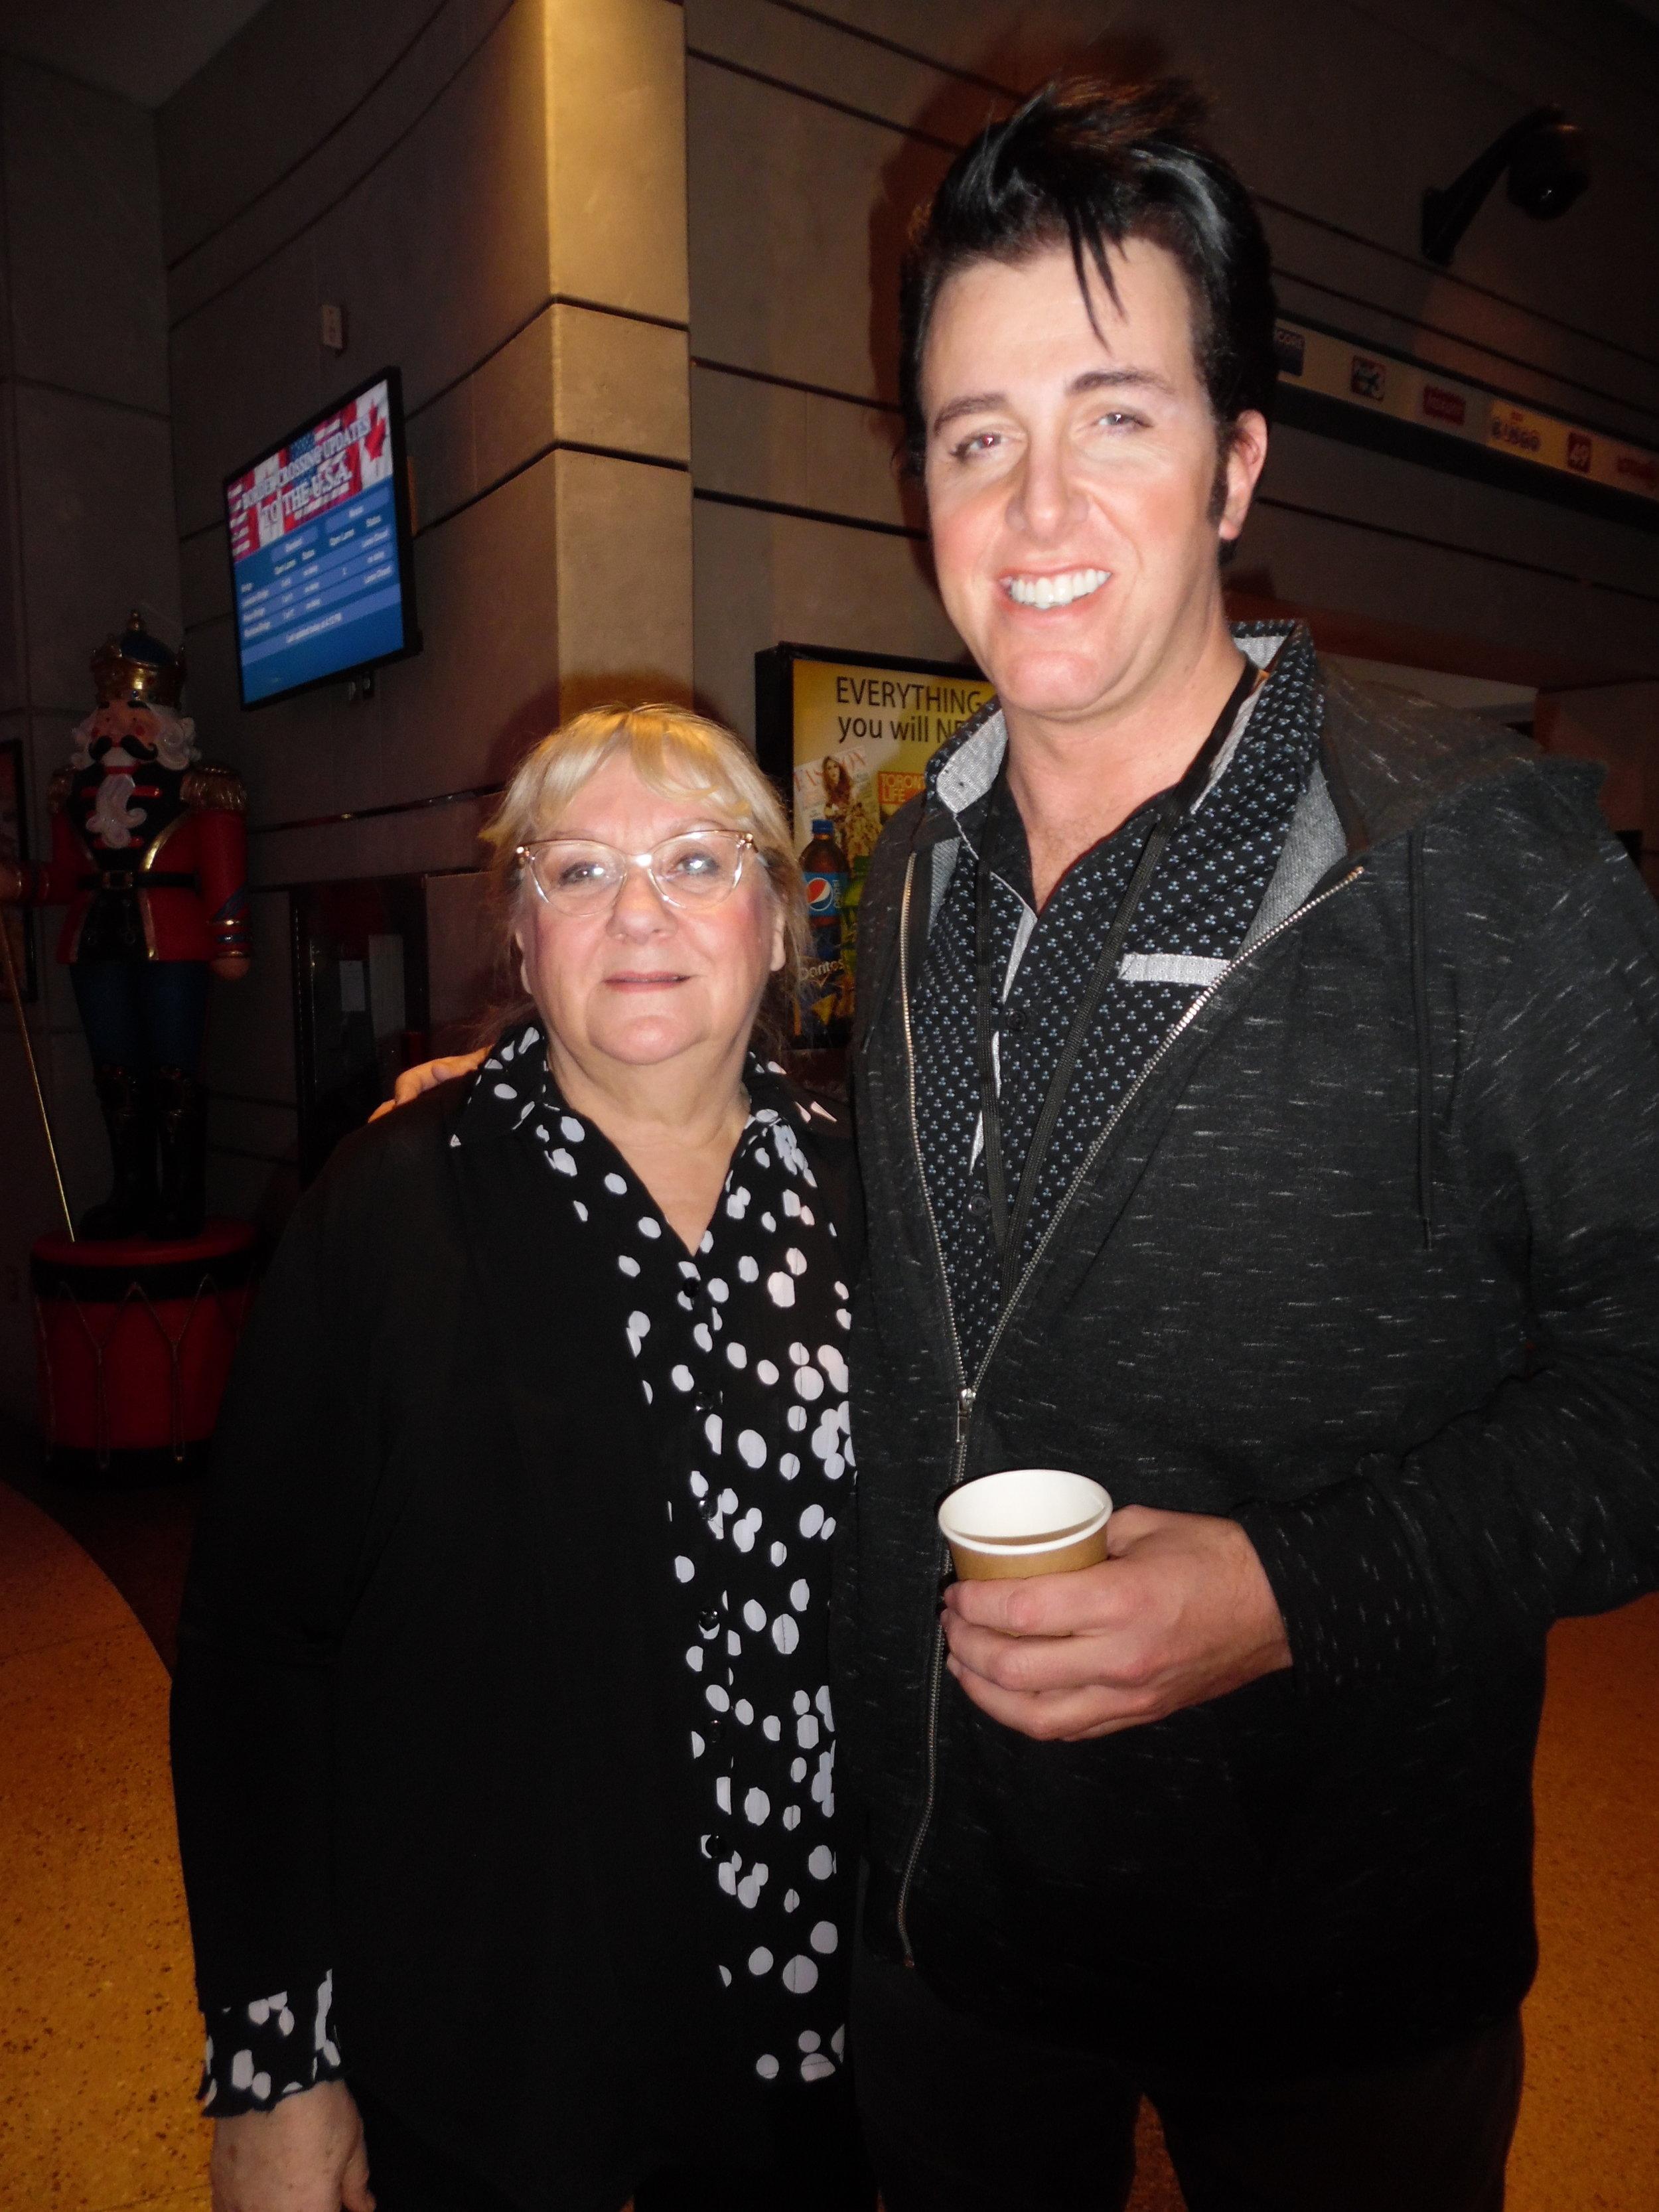 ETA  Matt Cage  and Carolyn in the lobby at Casino Niagara, November 22nd, 2017.